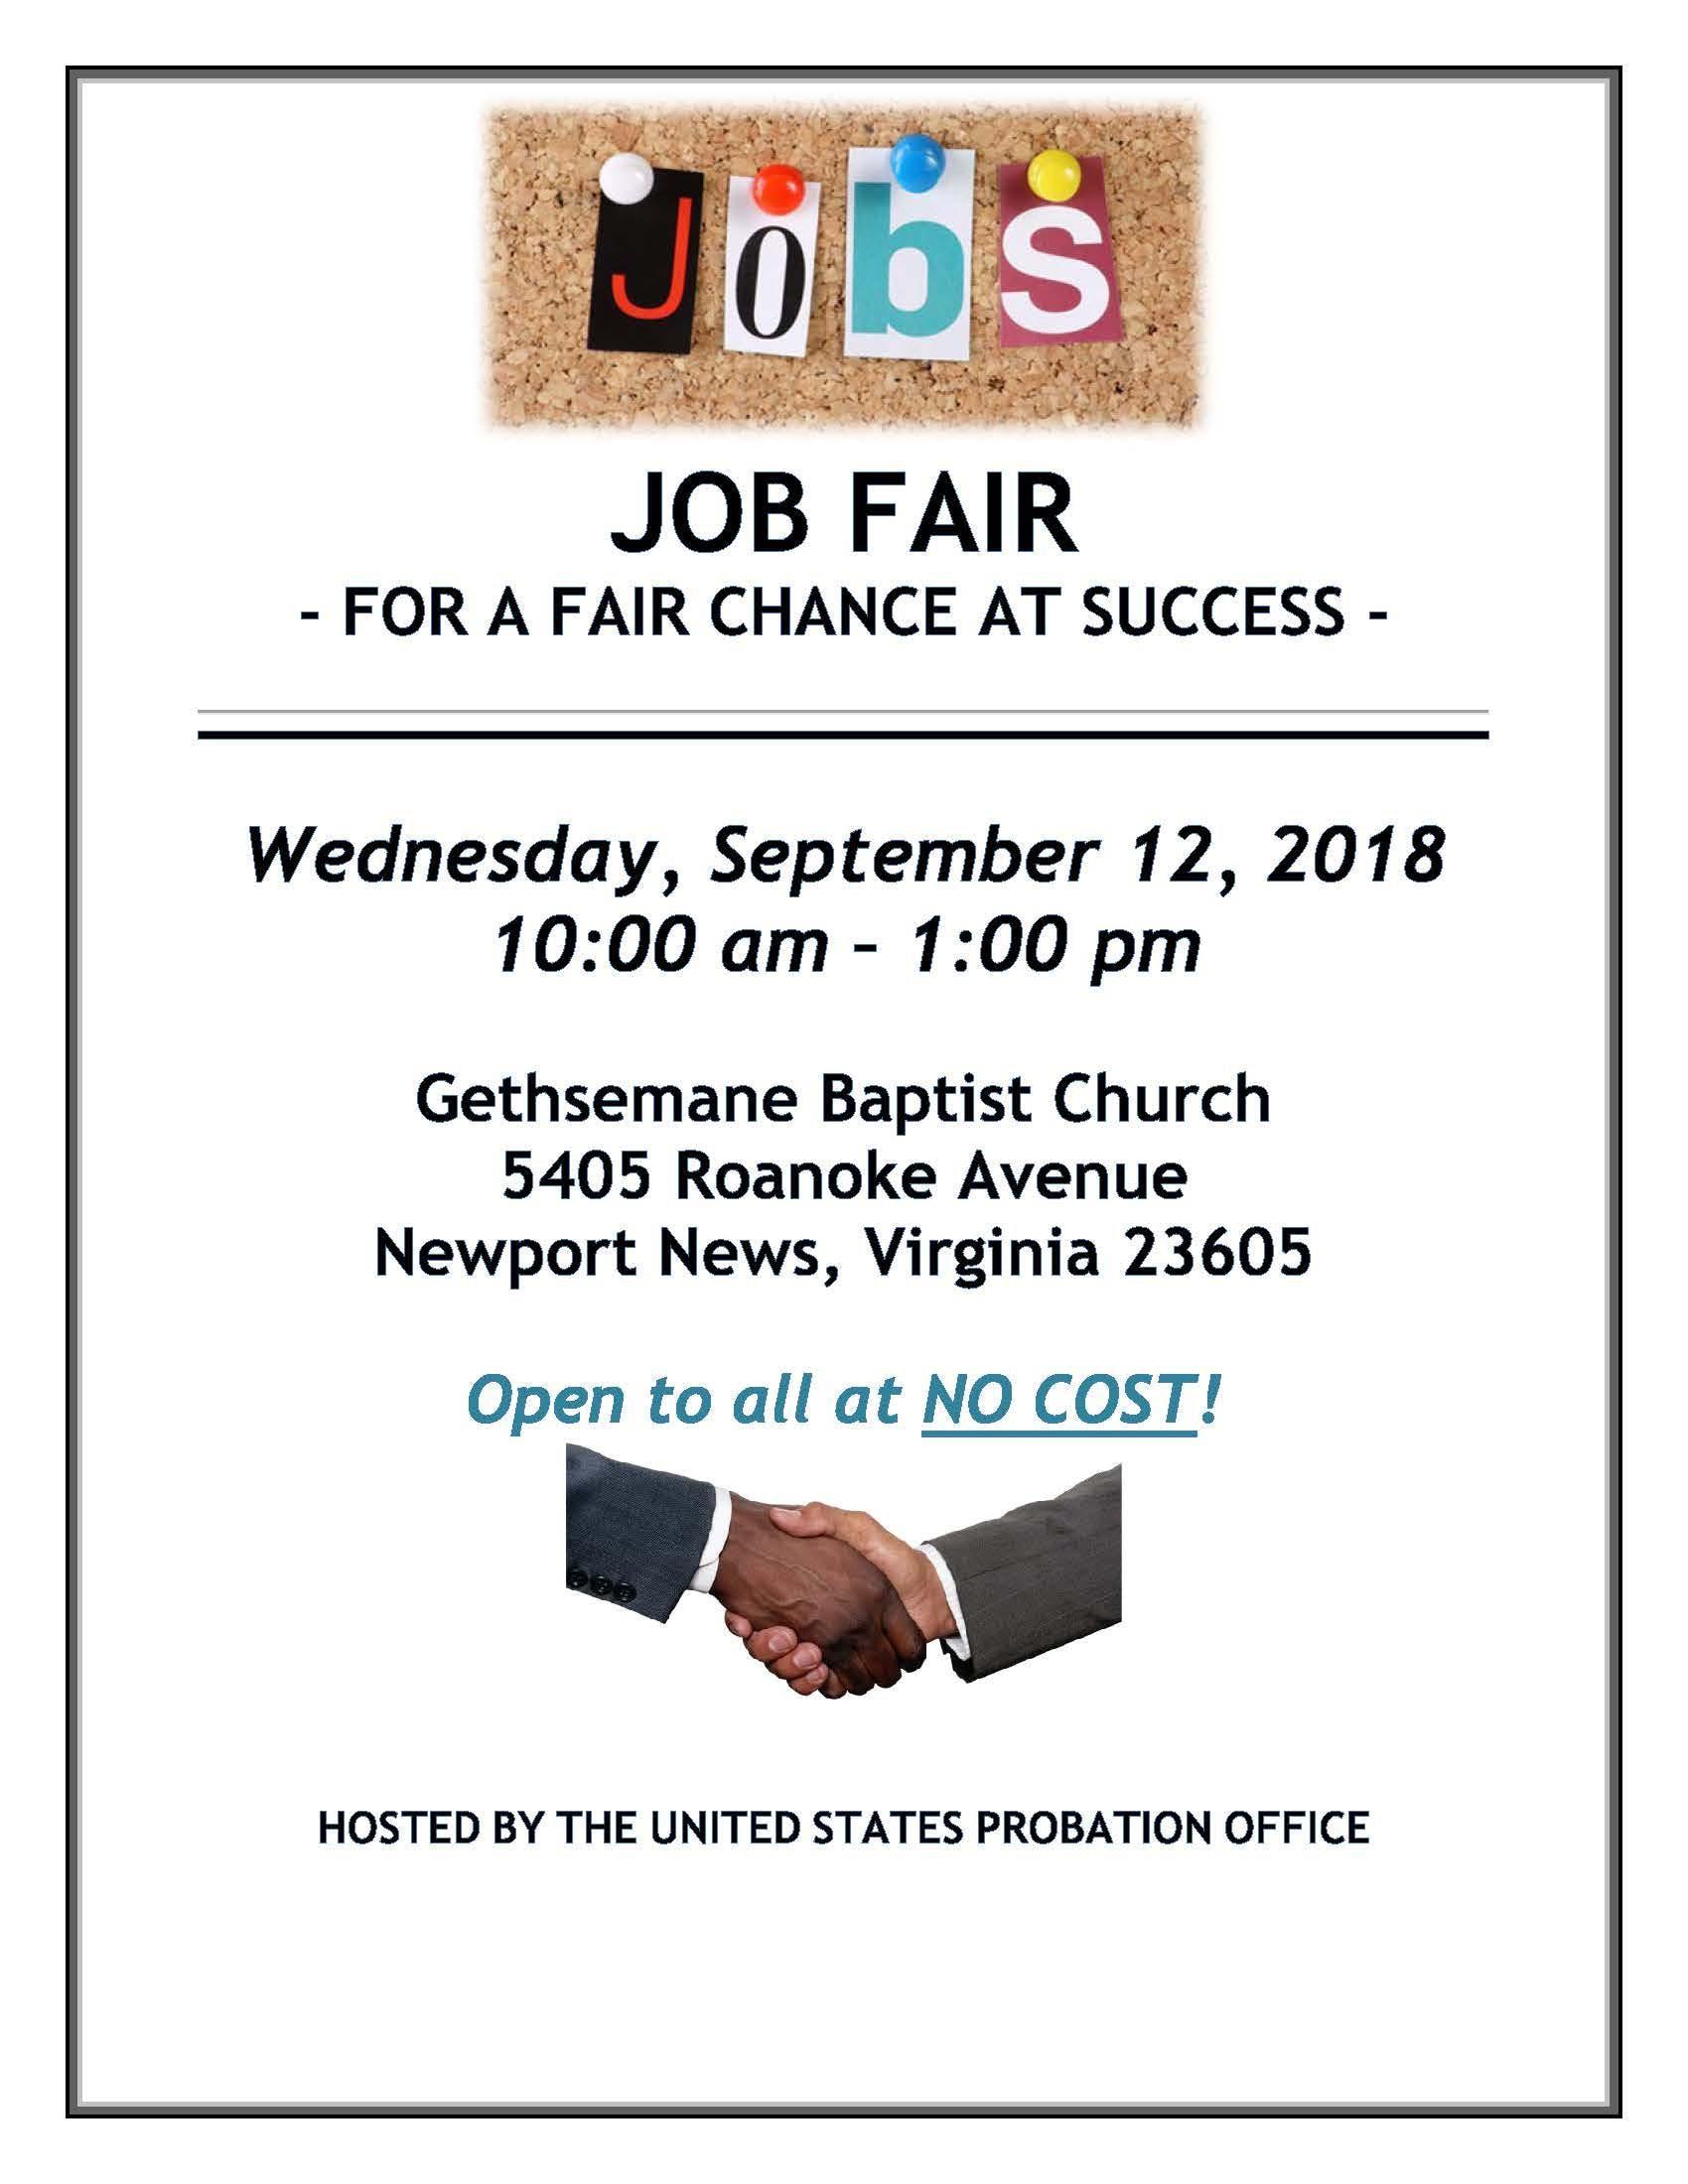 Job Fair for a Fair Chance at Success (Vendor Registration